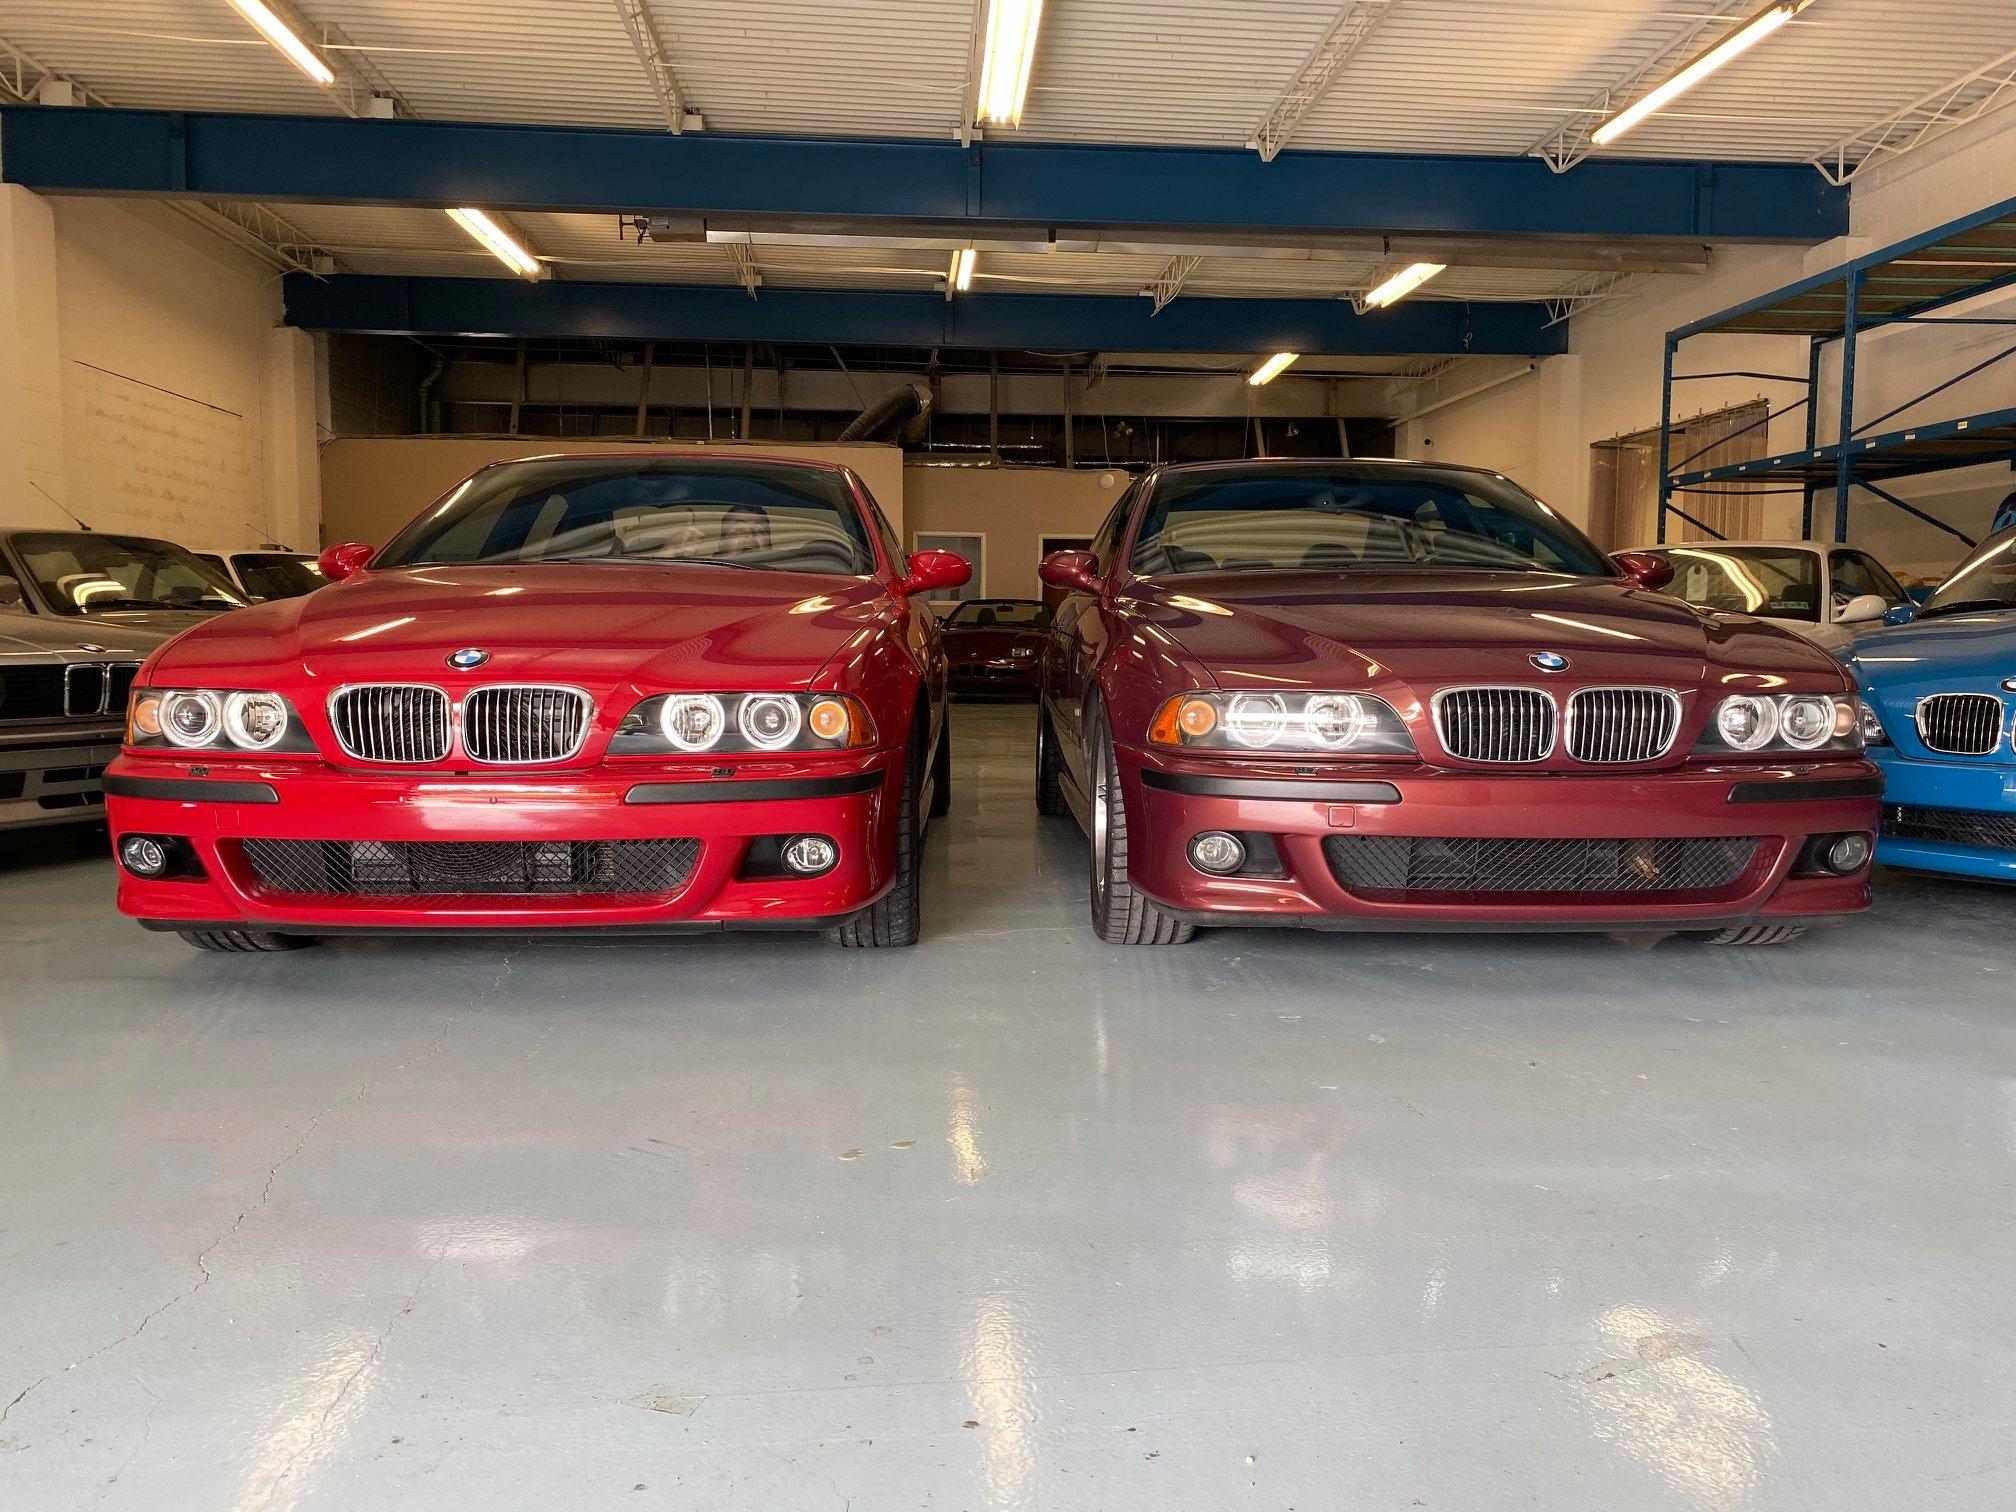 BMW_M5_E39_Imola_Red_0012